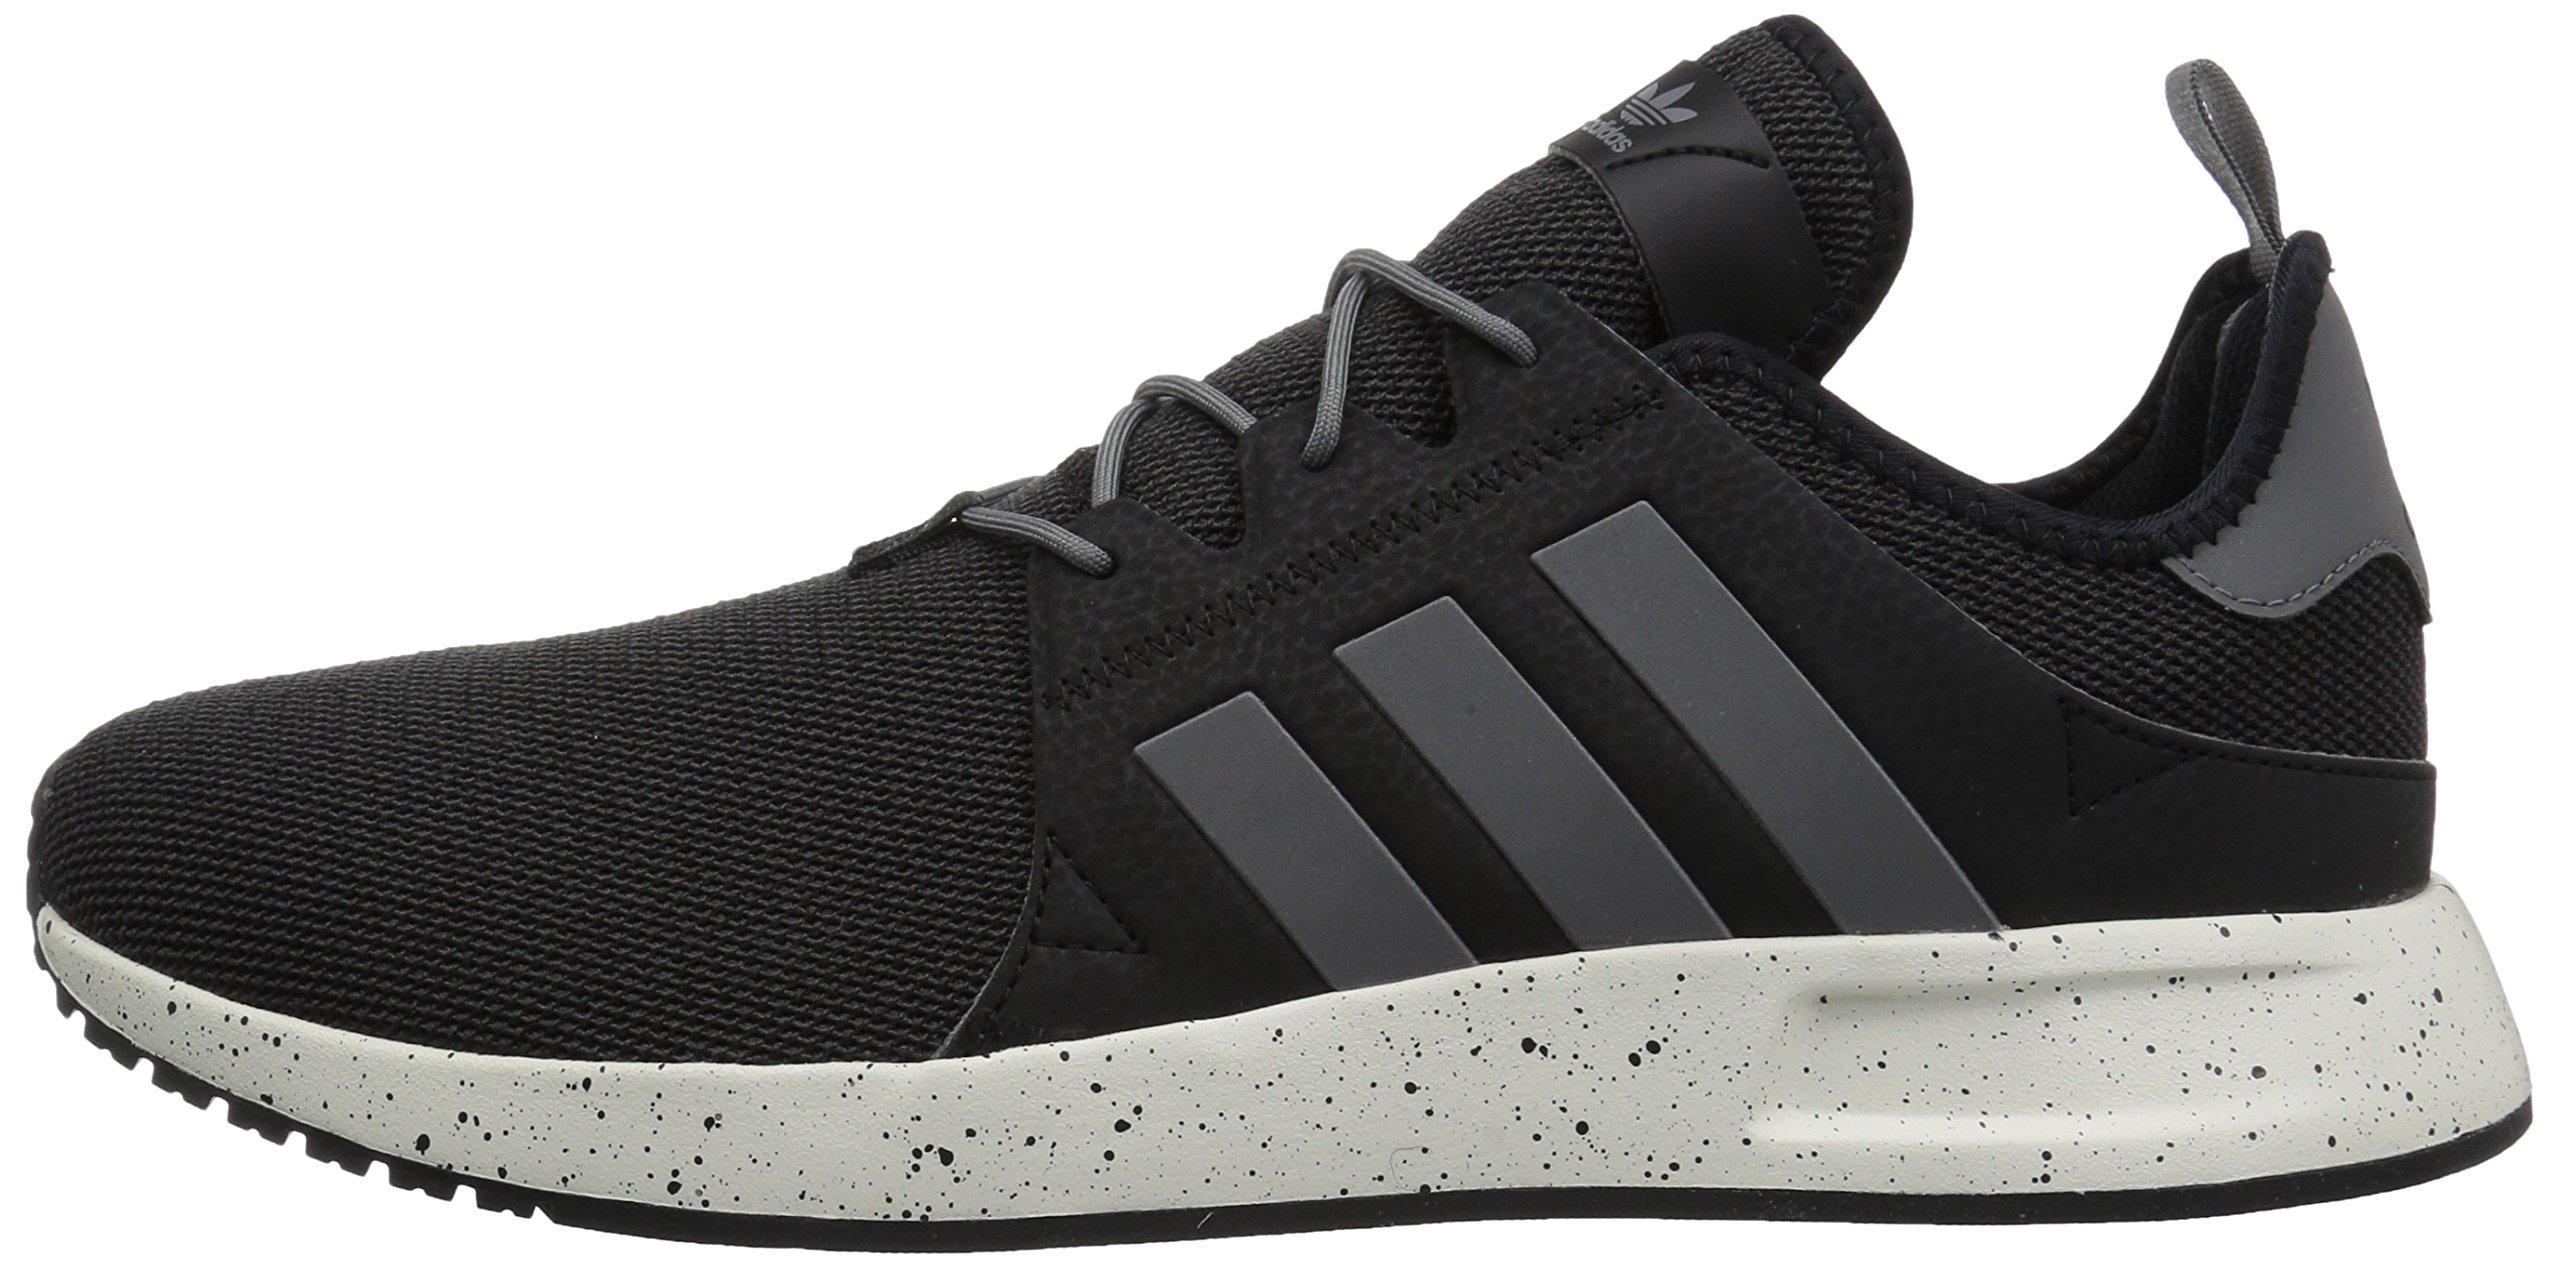 adidas Originals Mens X_PLR Running Shoe Sneaker Grey/Black, 4.5 M US by adidas Originals (Image #5)